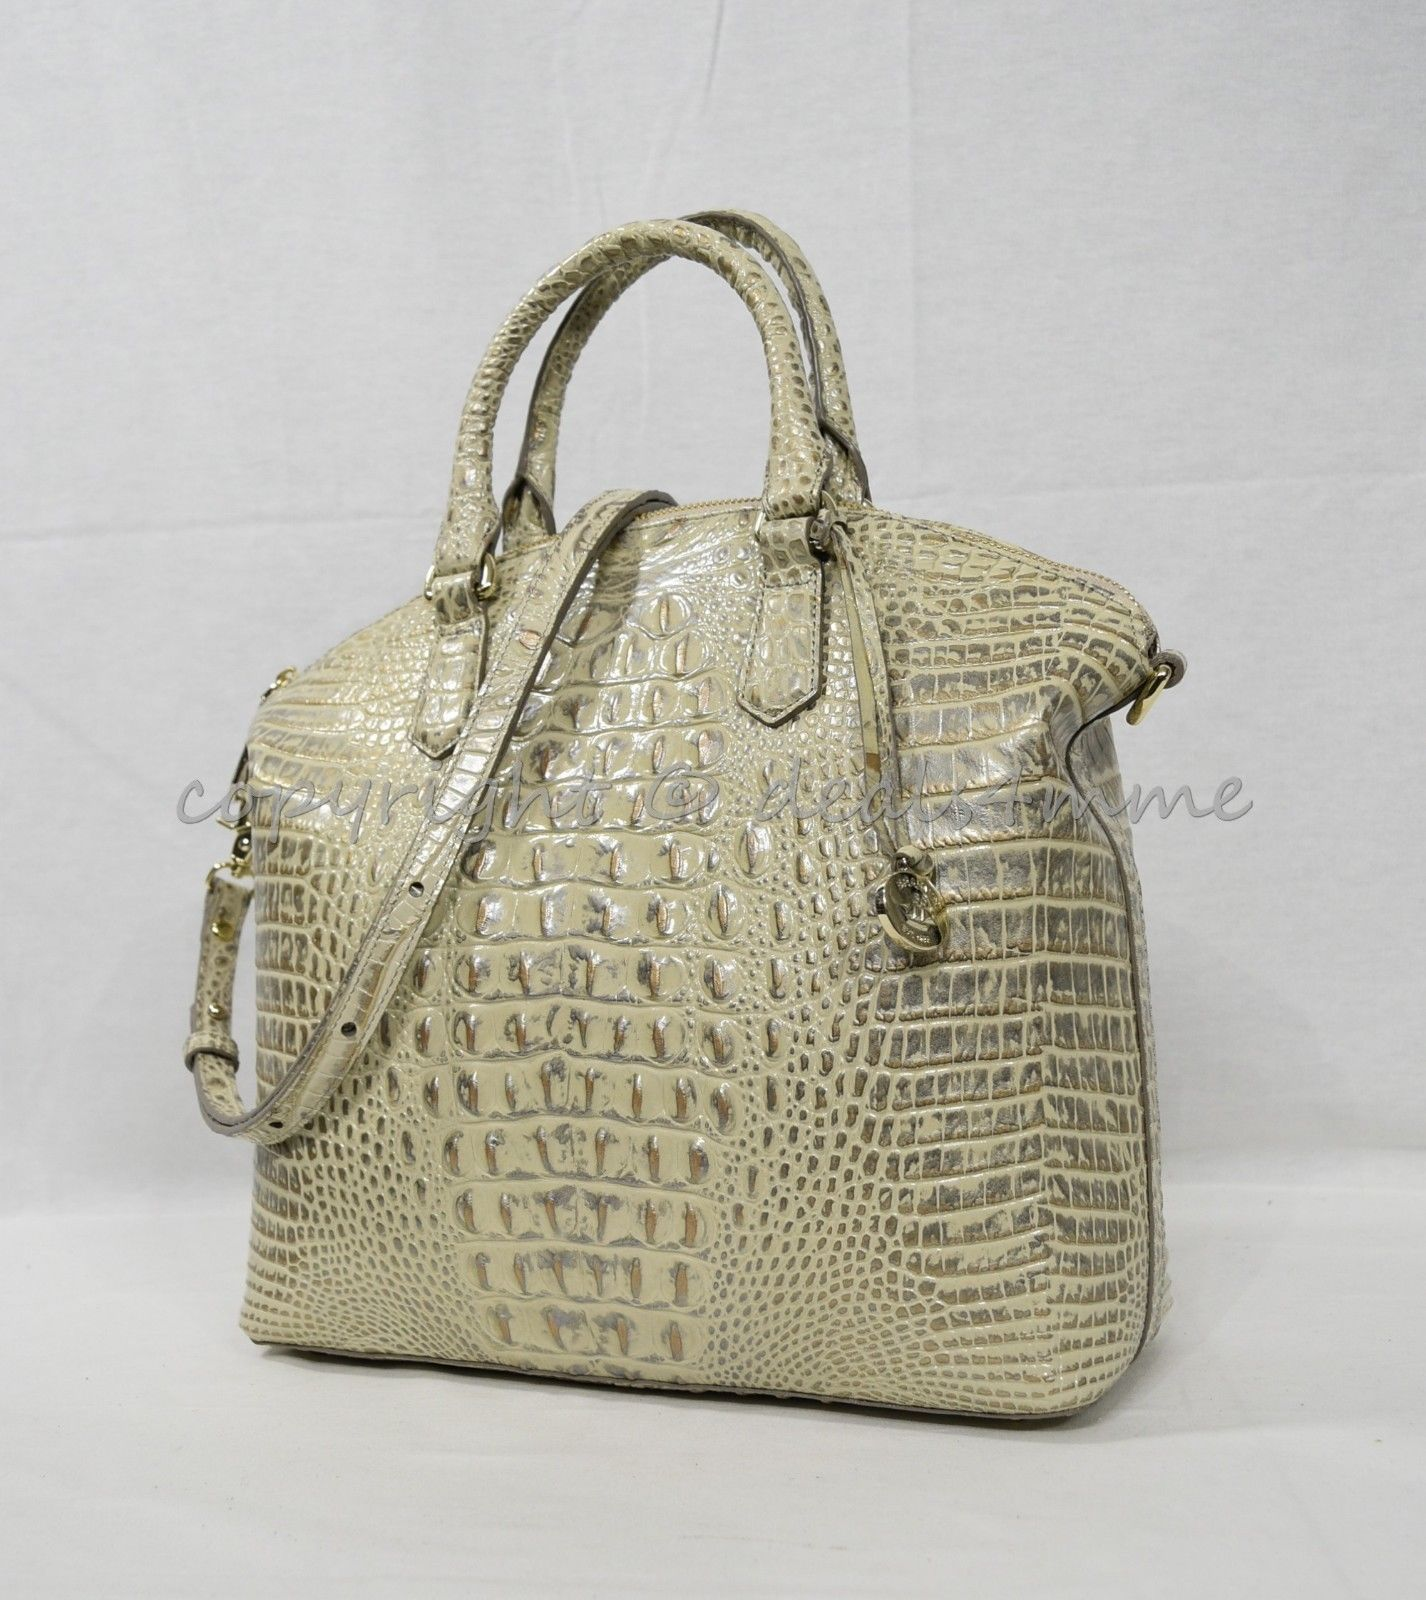 NWT Brahmin Large Leather Duxbury Satchel/Shoulder Bag in Silver Birch Melbourne